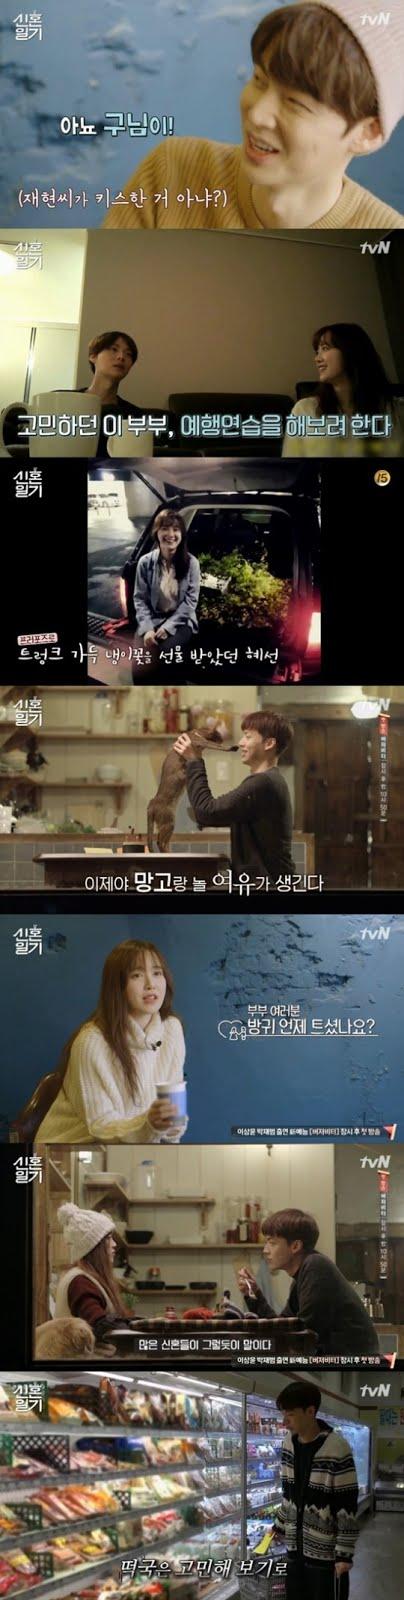 tvN] The Lovebirds:Year 1 신혼일기 Newlywed Diary with Ahn Jae Hyun